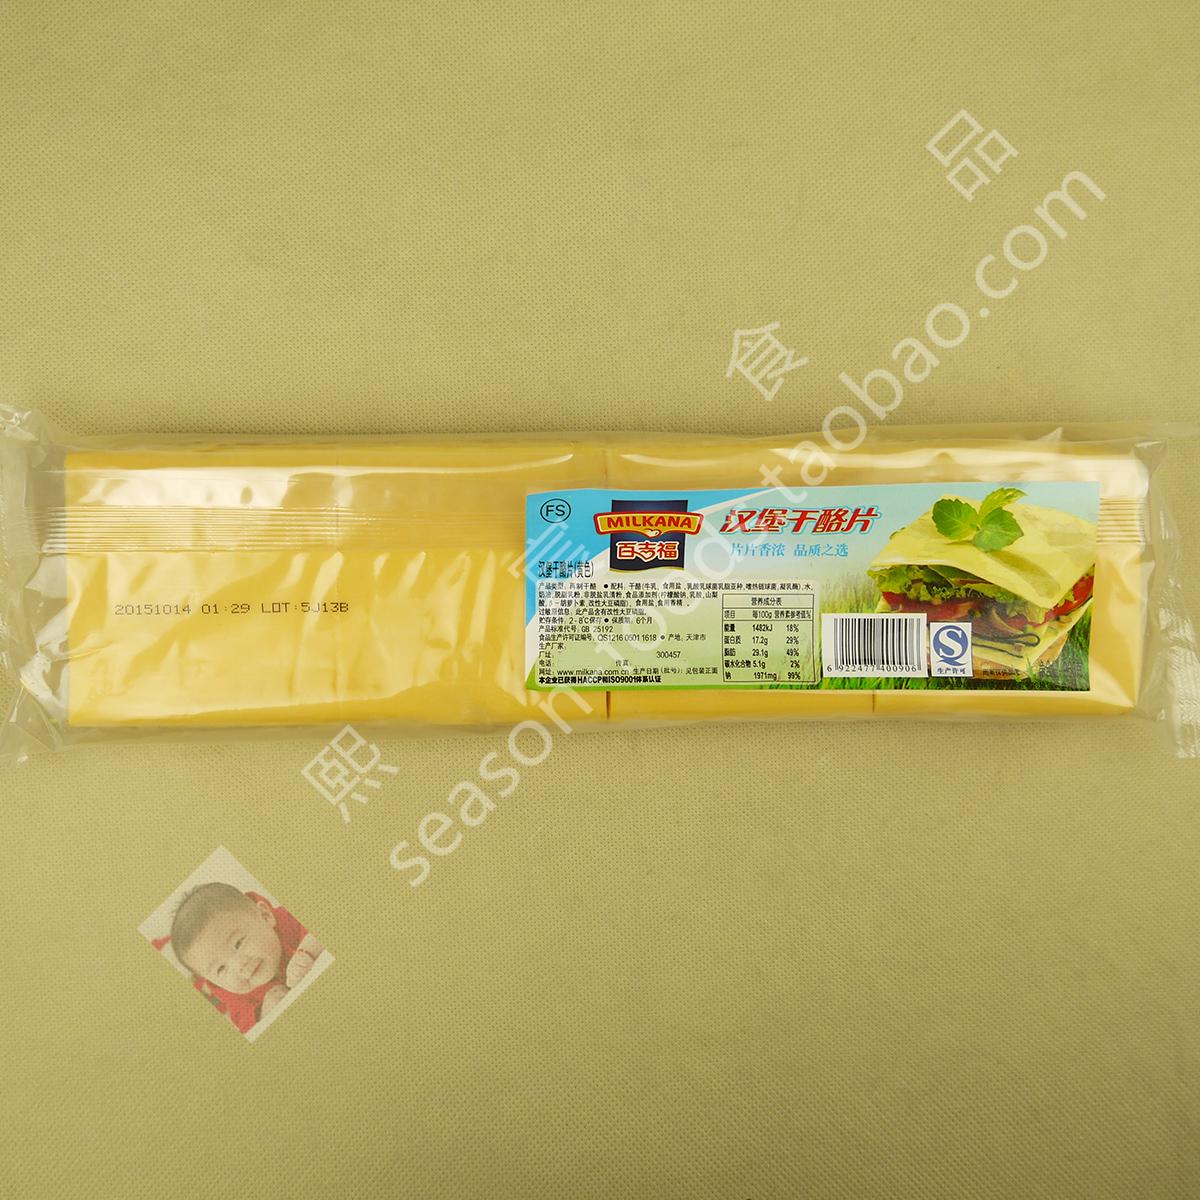 Milkana Quick Serve Slices Pale百吉福黄芝士片8011-27新券